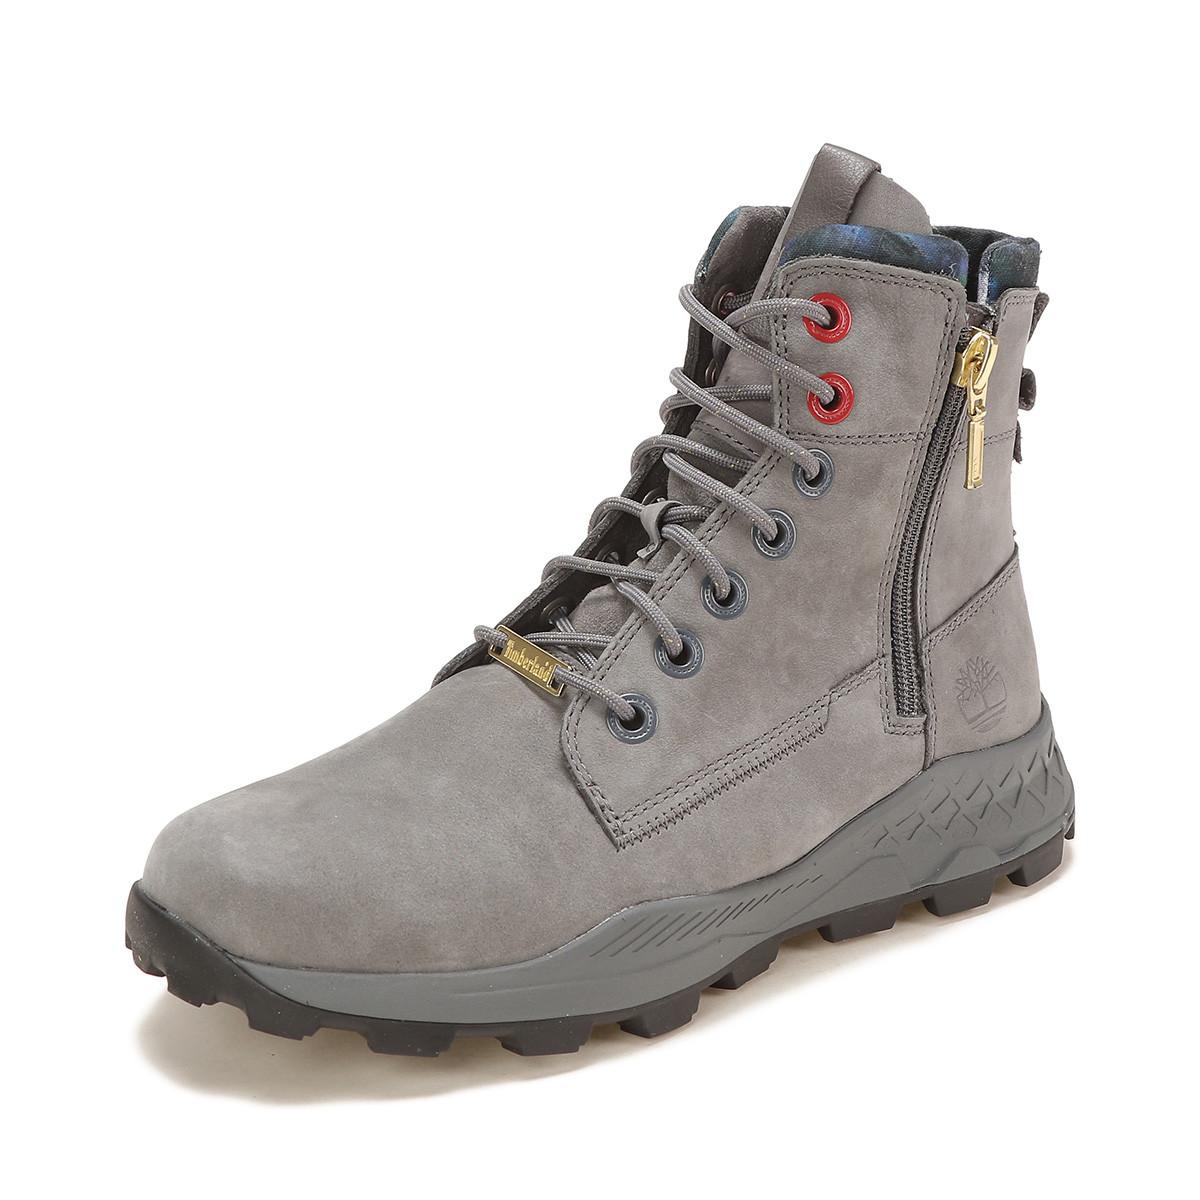 Timberland 添柏岚 A41AW033 男款休闲工装靴